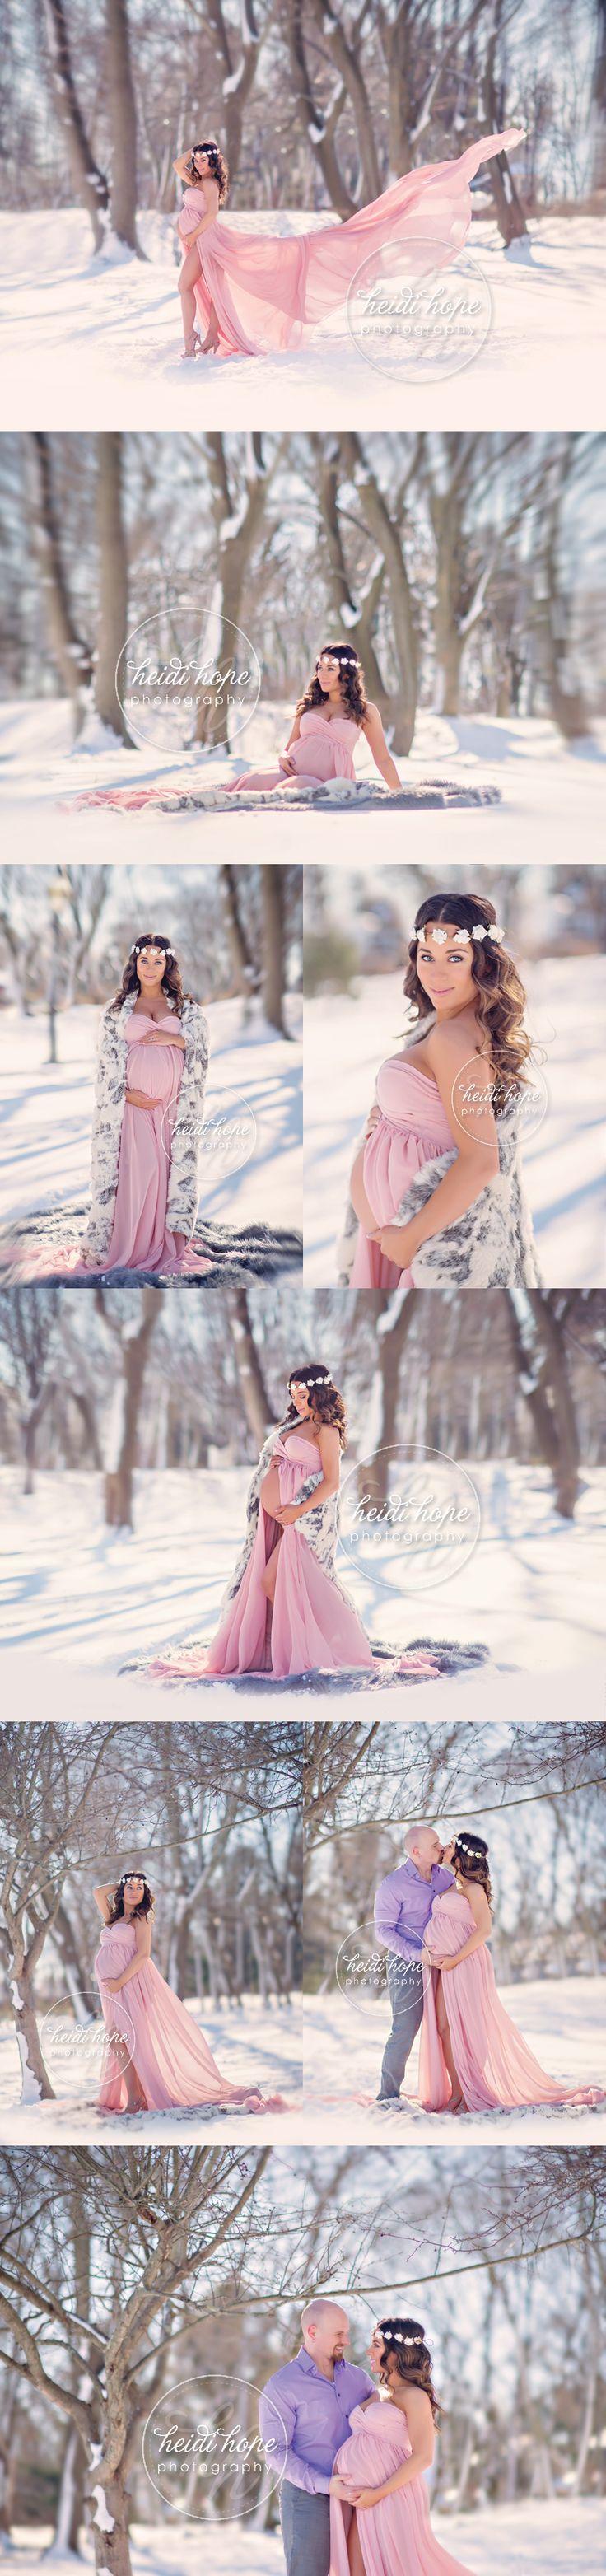 best baby fotos images on pinterest pregnancy pregnancy